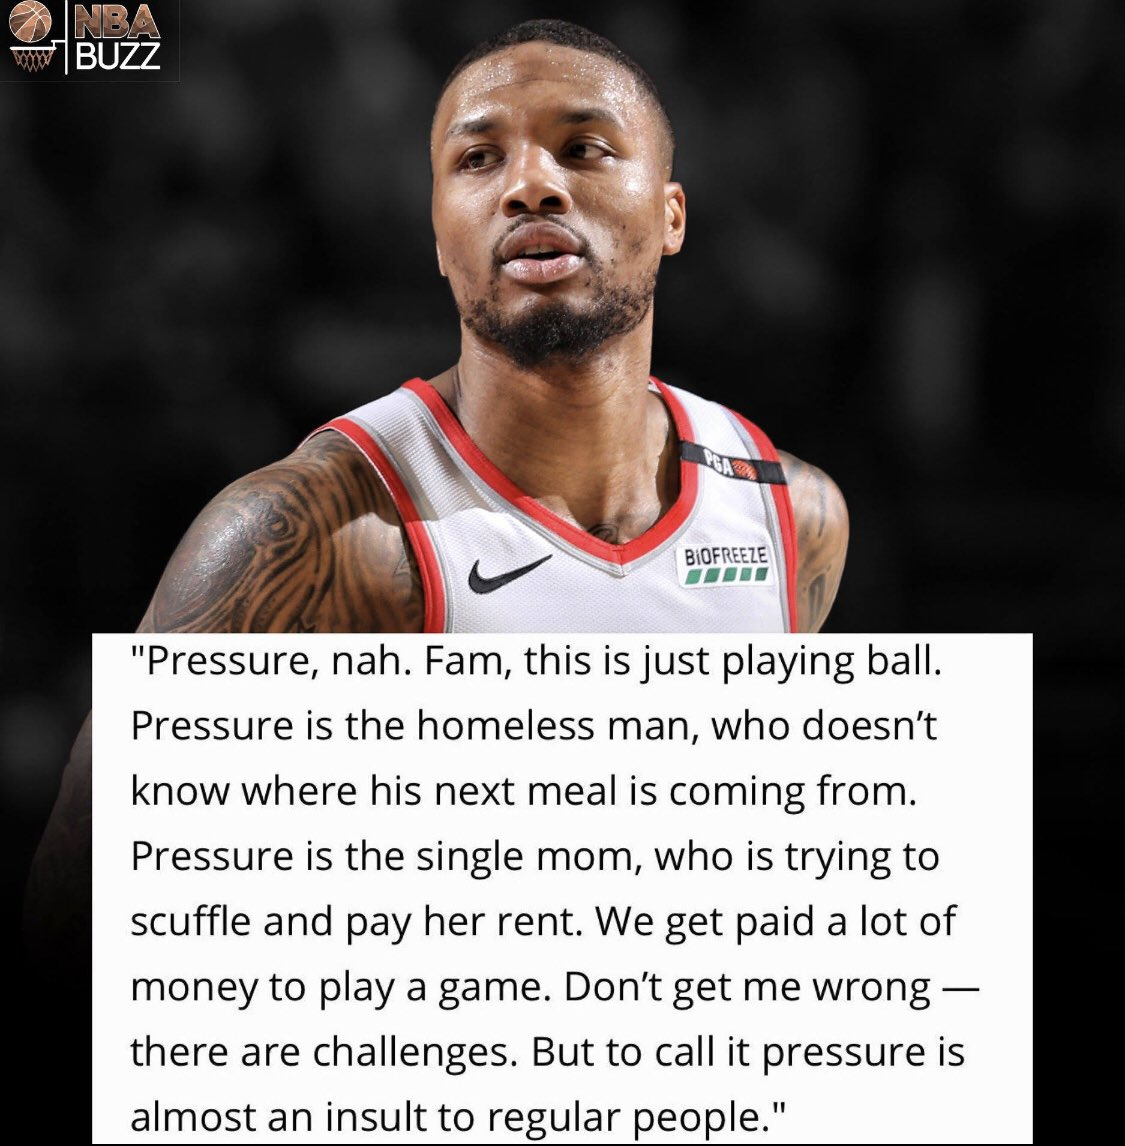 Basketball is fun Life is Pressure